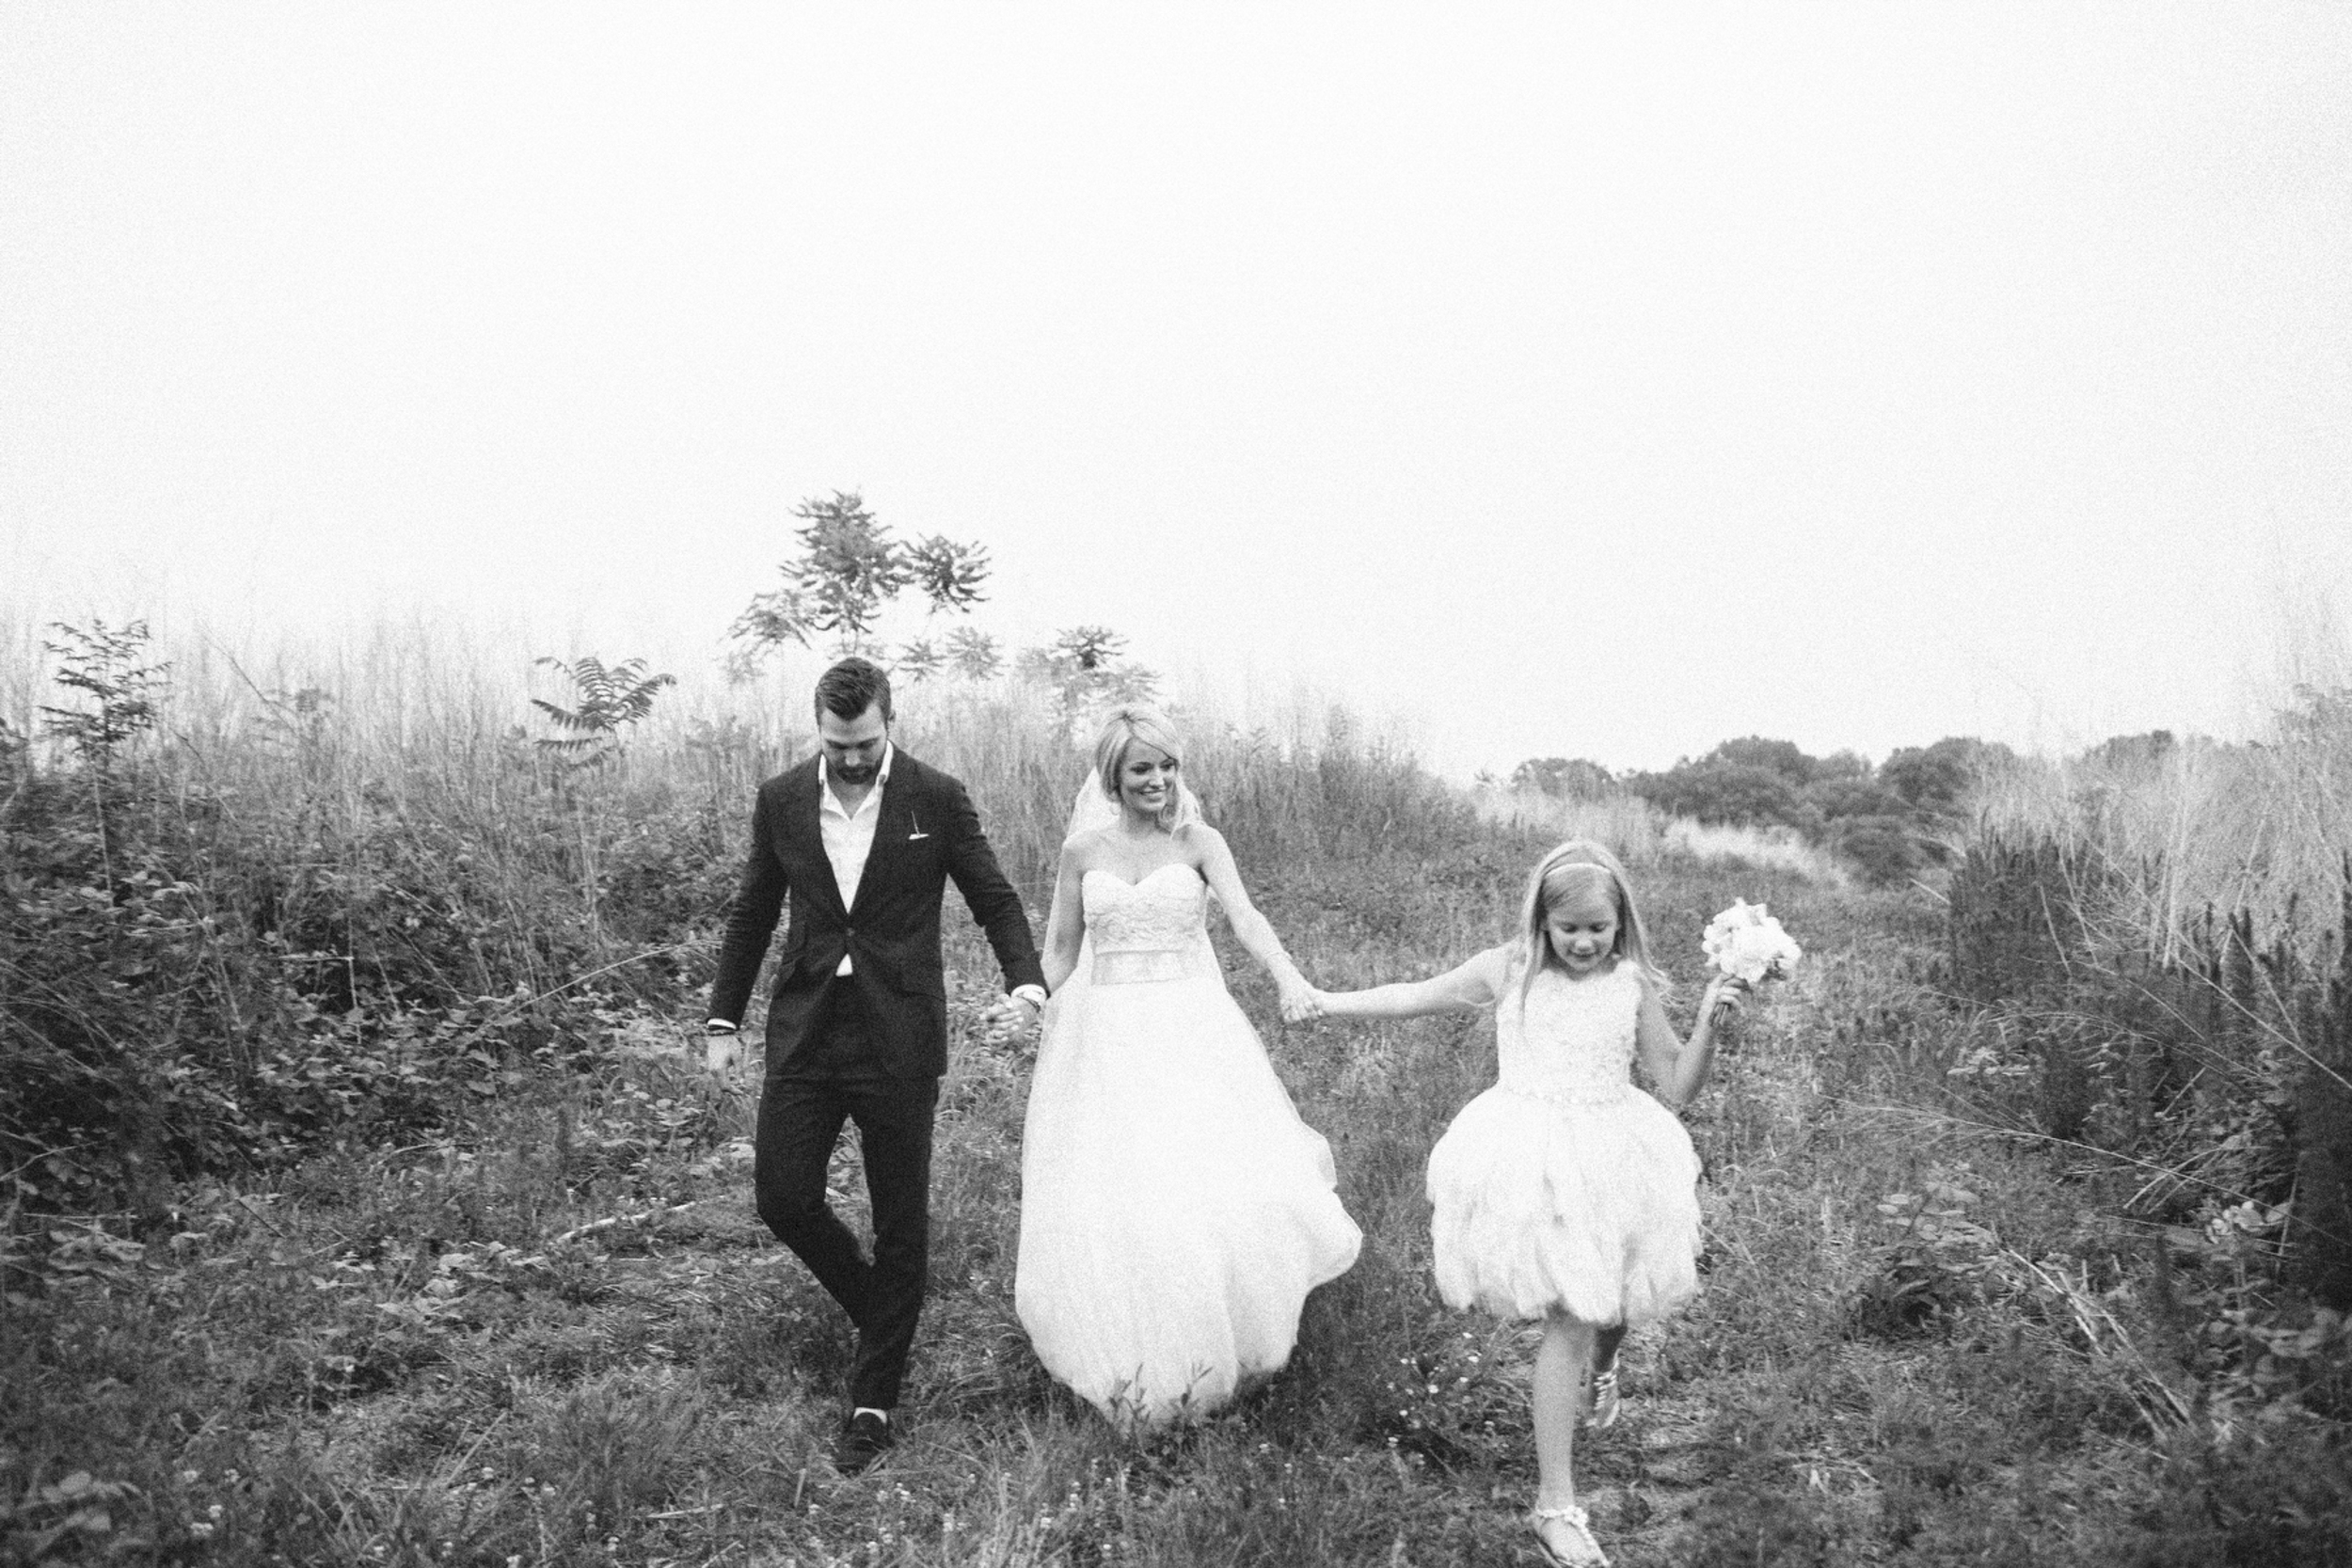 south_carolina_farm_wedding_rustic_chic_surprise_secret_luxe_wedding_bachelorette_emily_maynard_real_weddings-56.jpg